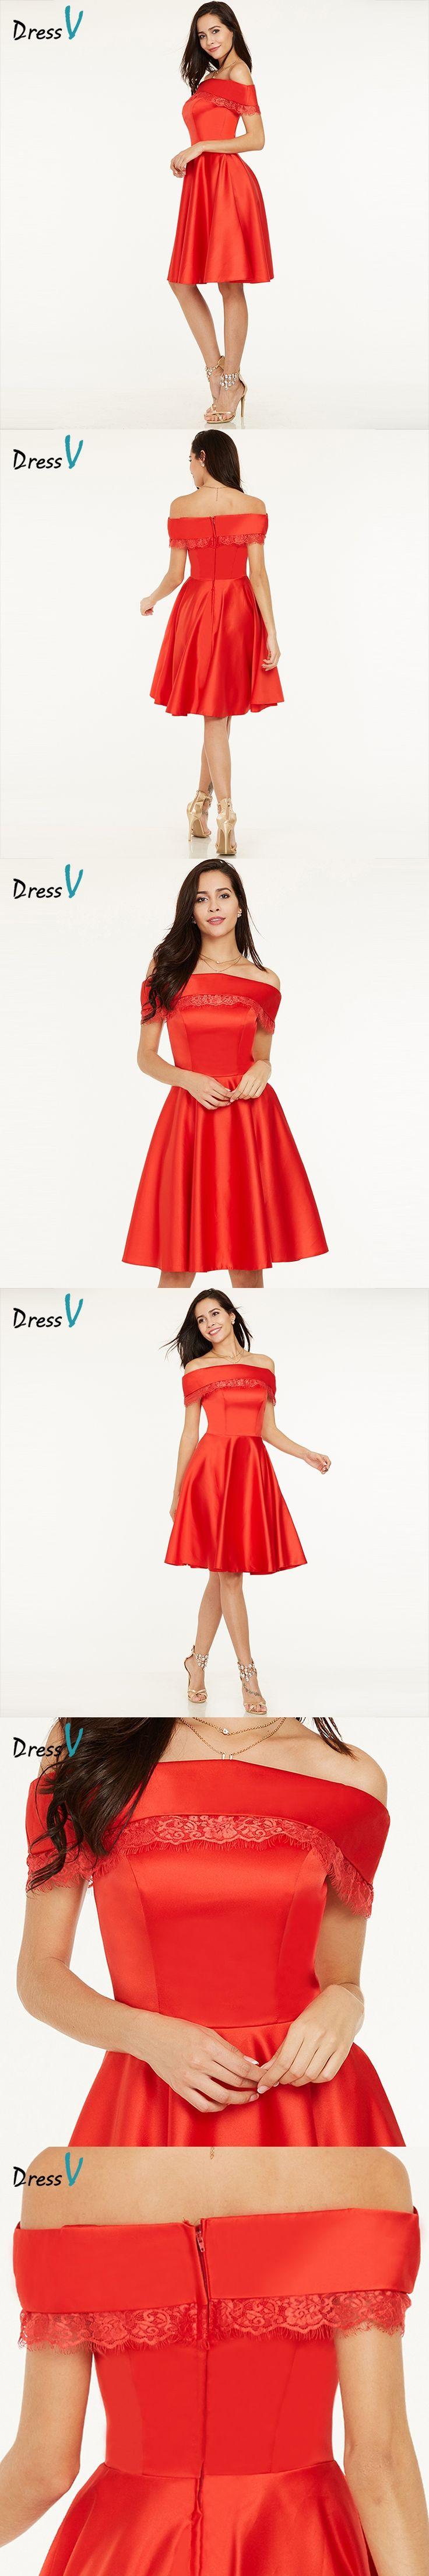 Dressv red evening dress cheap boat neck sleeveless a line off the shoulder black wedding party formal dress evening dresses